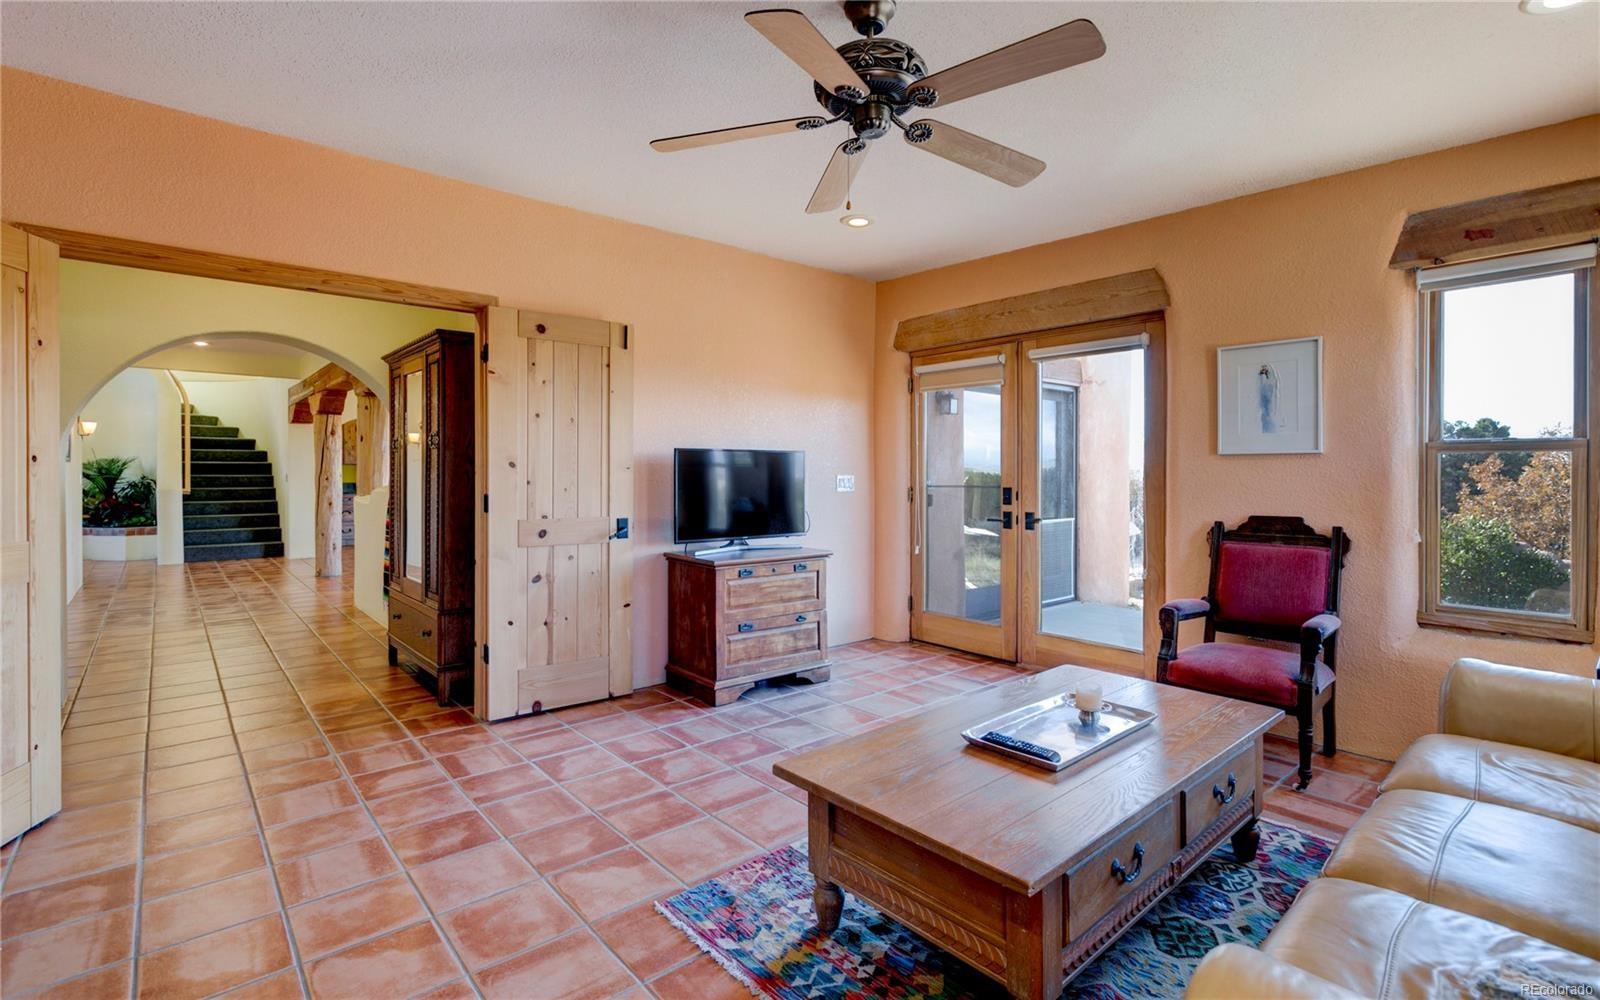 MLS# 3090448 - 20 - 7708 Sunset Ridge Drive, Pueblo, CO 81004